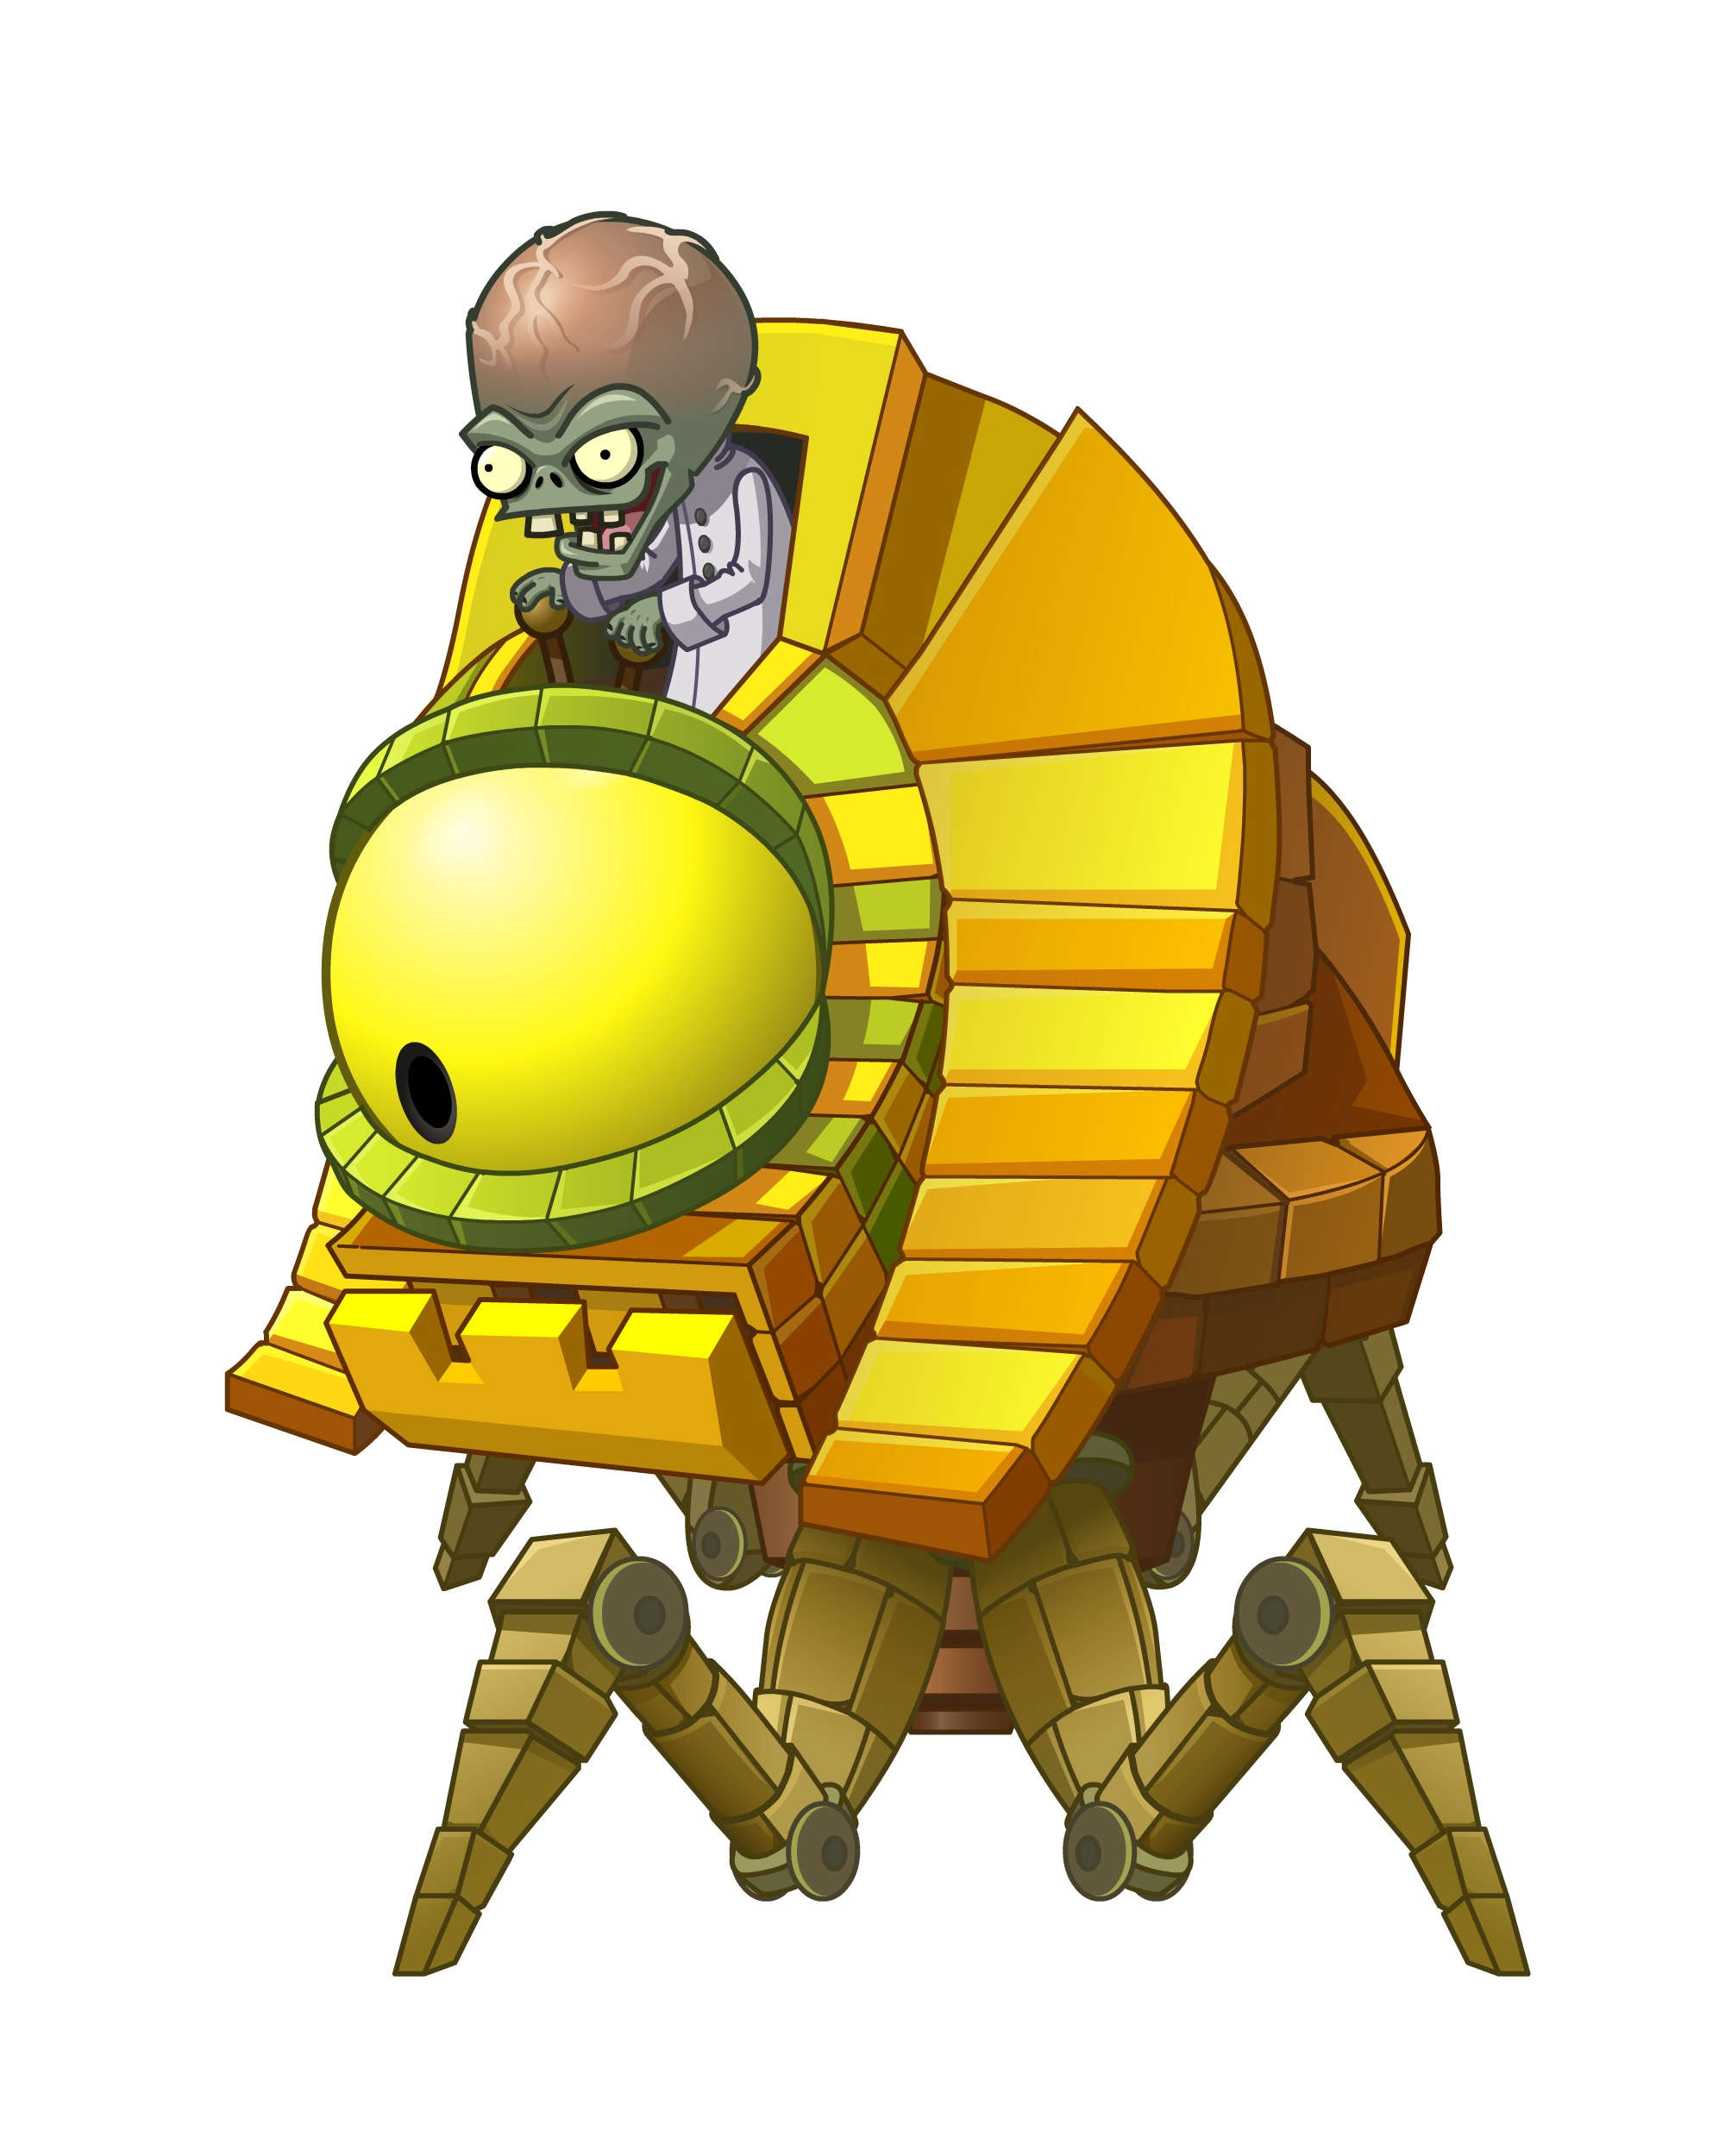 Zombot Sphinx-inator